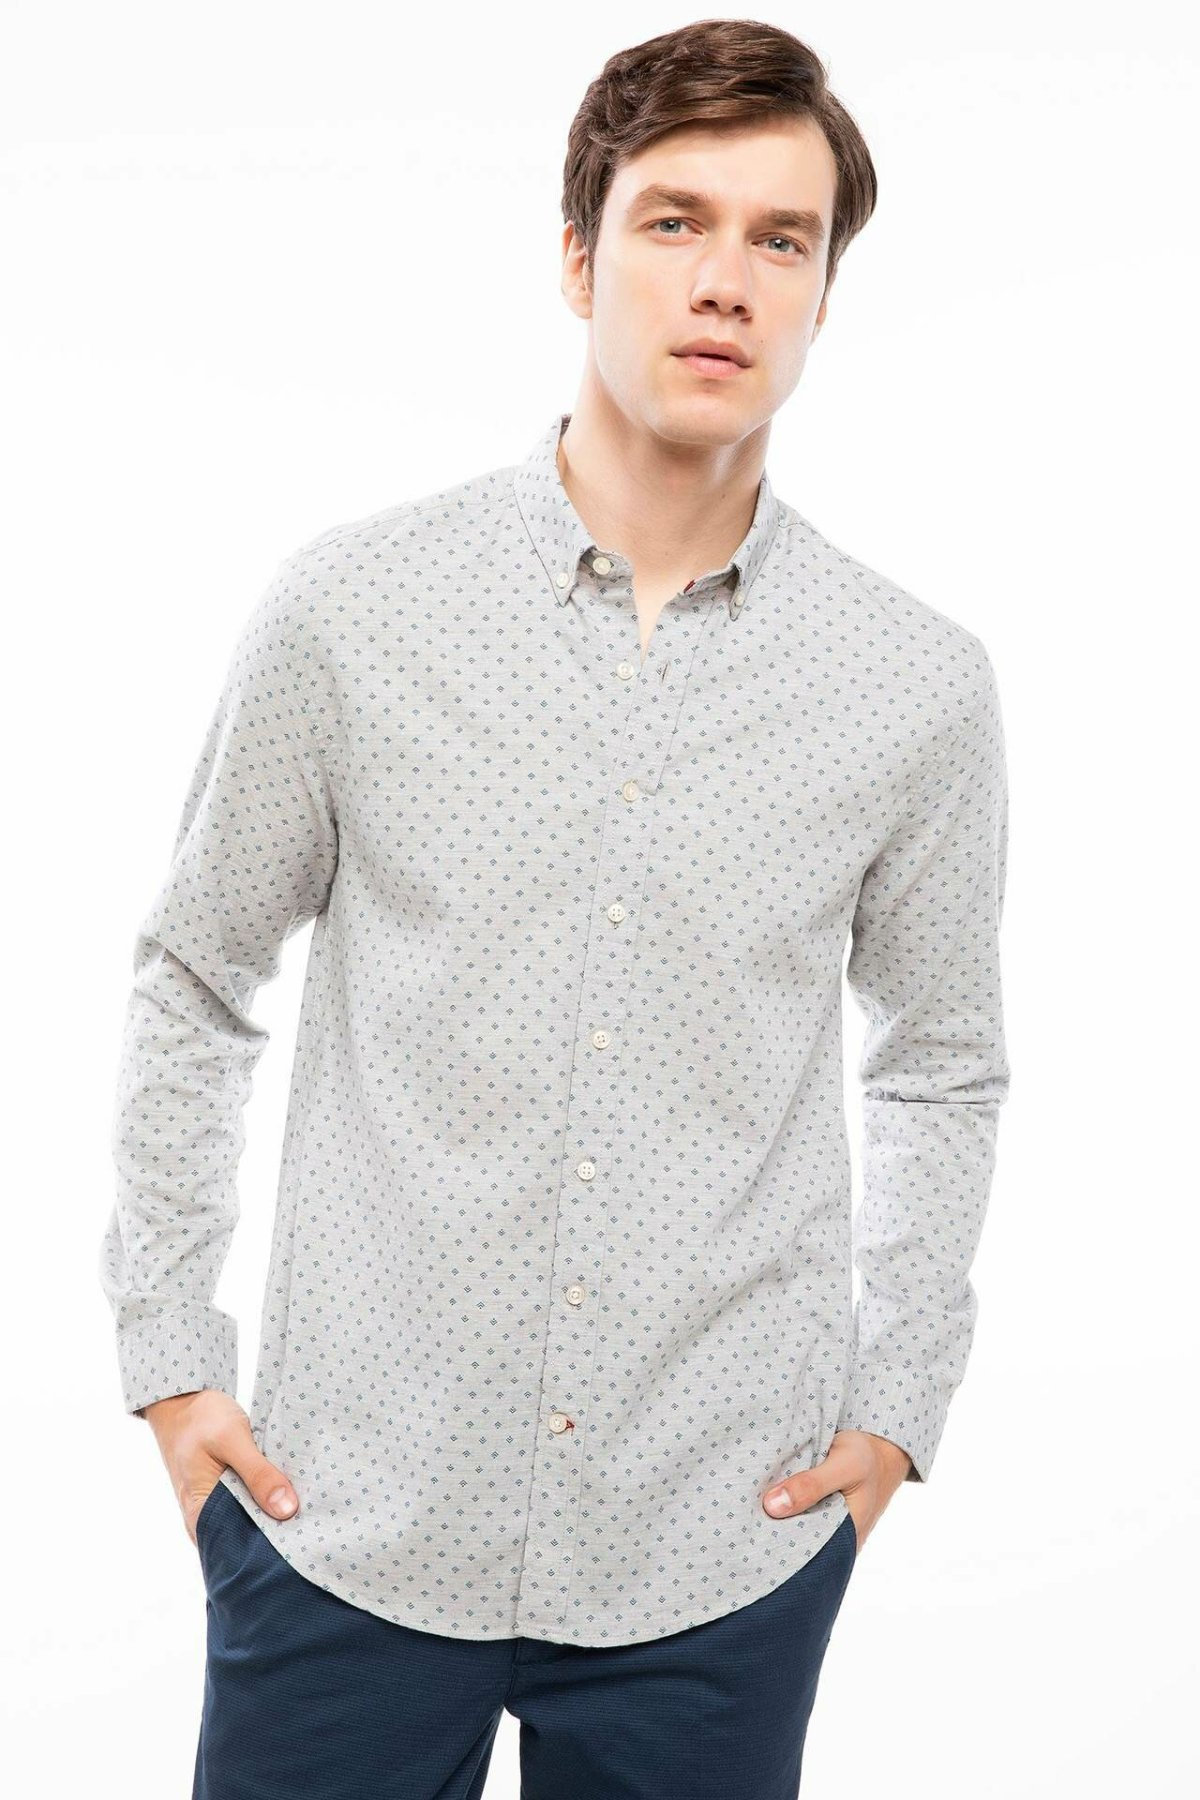 DeFacto Autumn White Man Long Sleeve Shirt Dot Prints Men Casual Smart Cotton Top Shirts Male Shirts-I9837AZ18AU